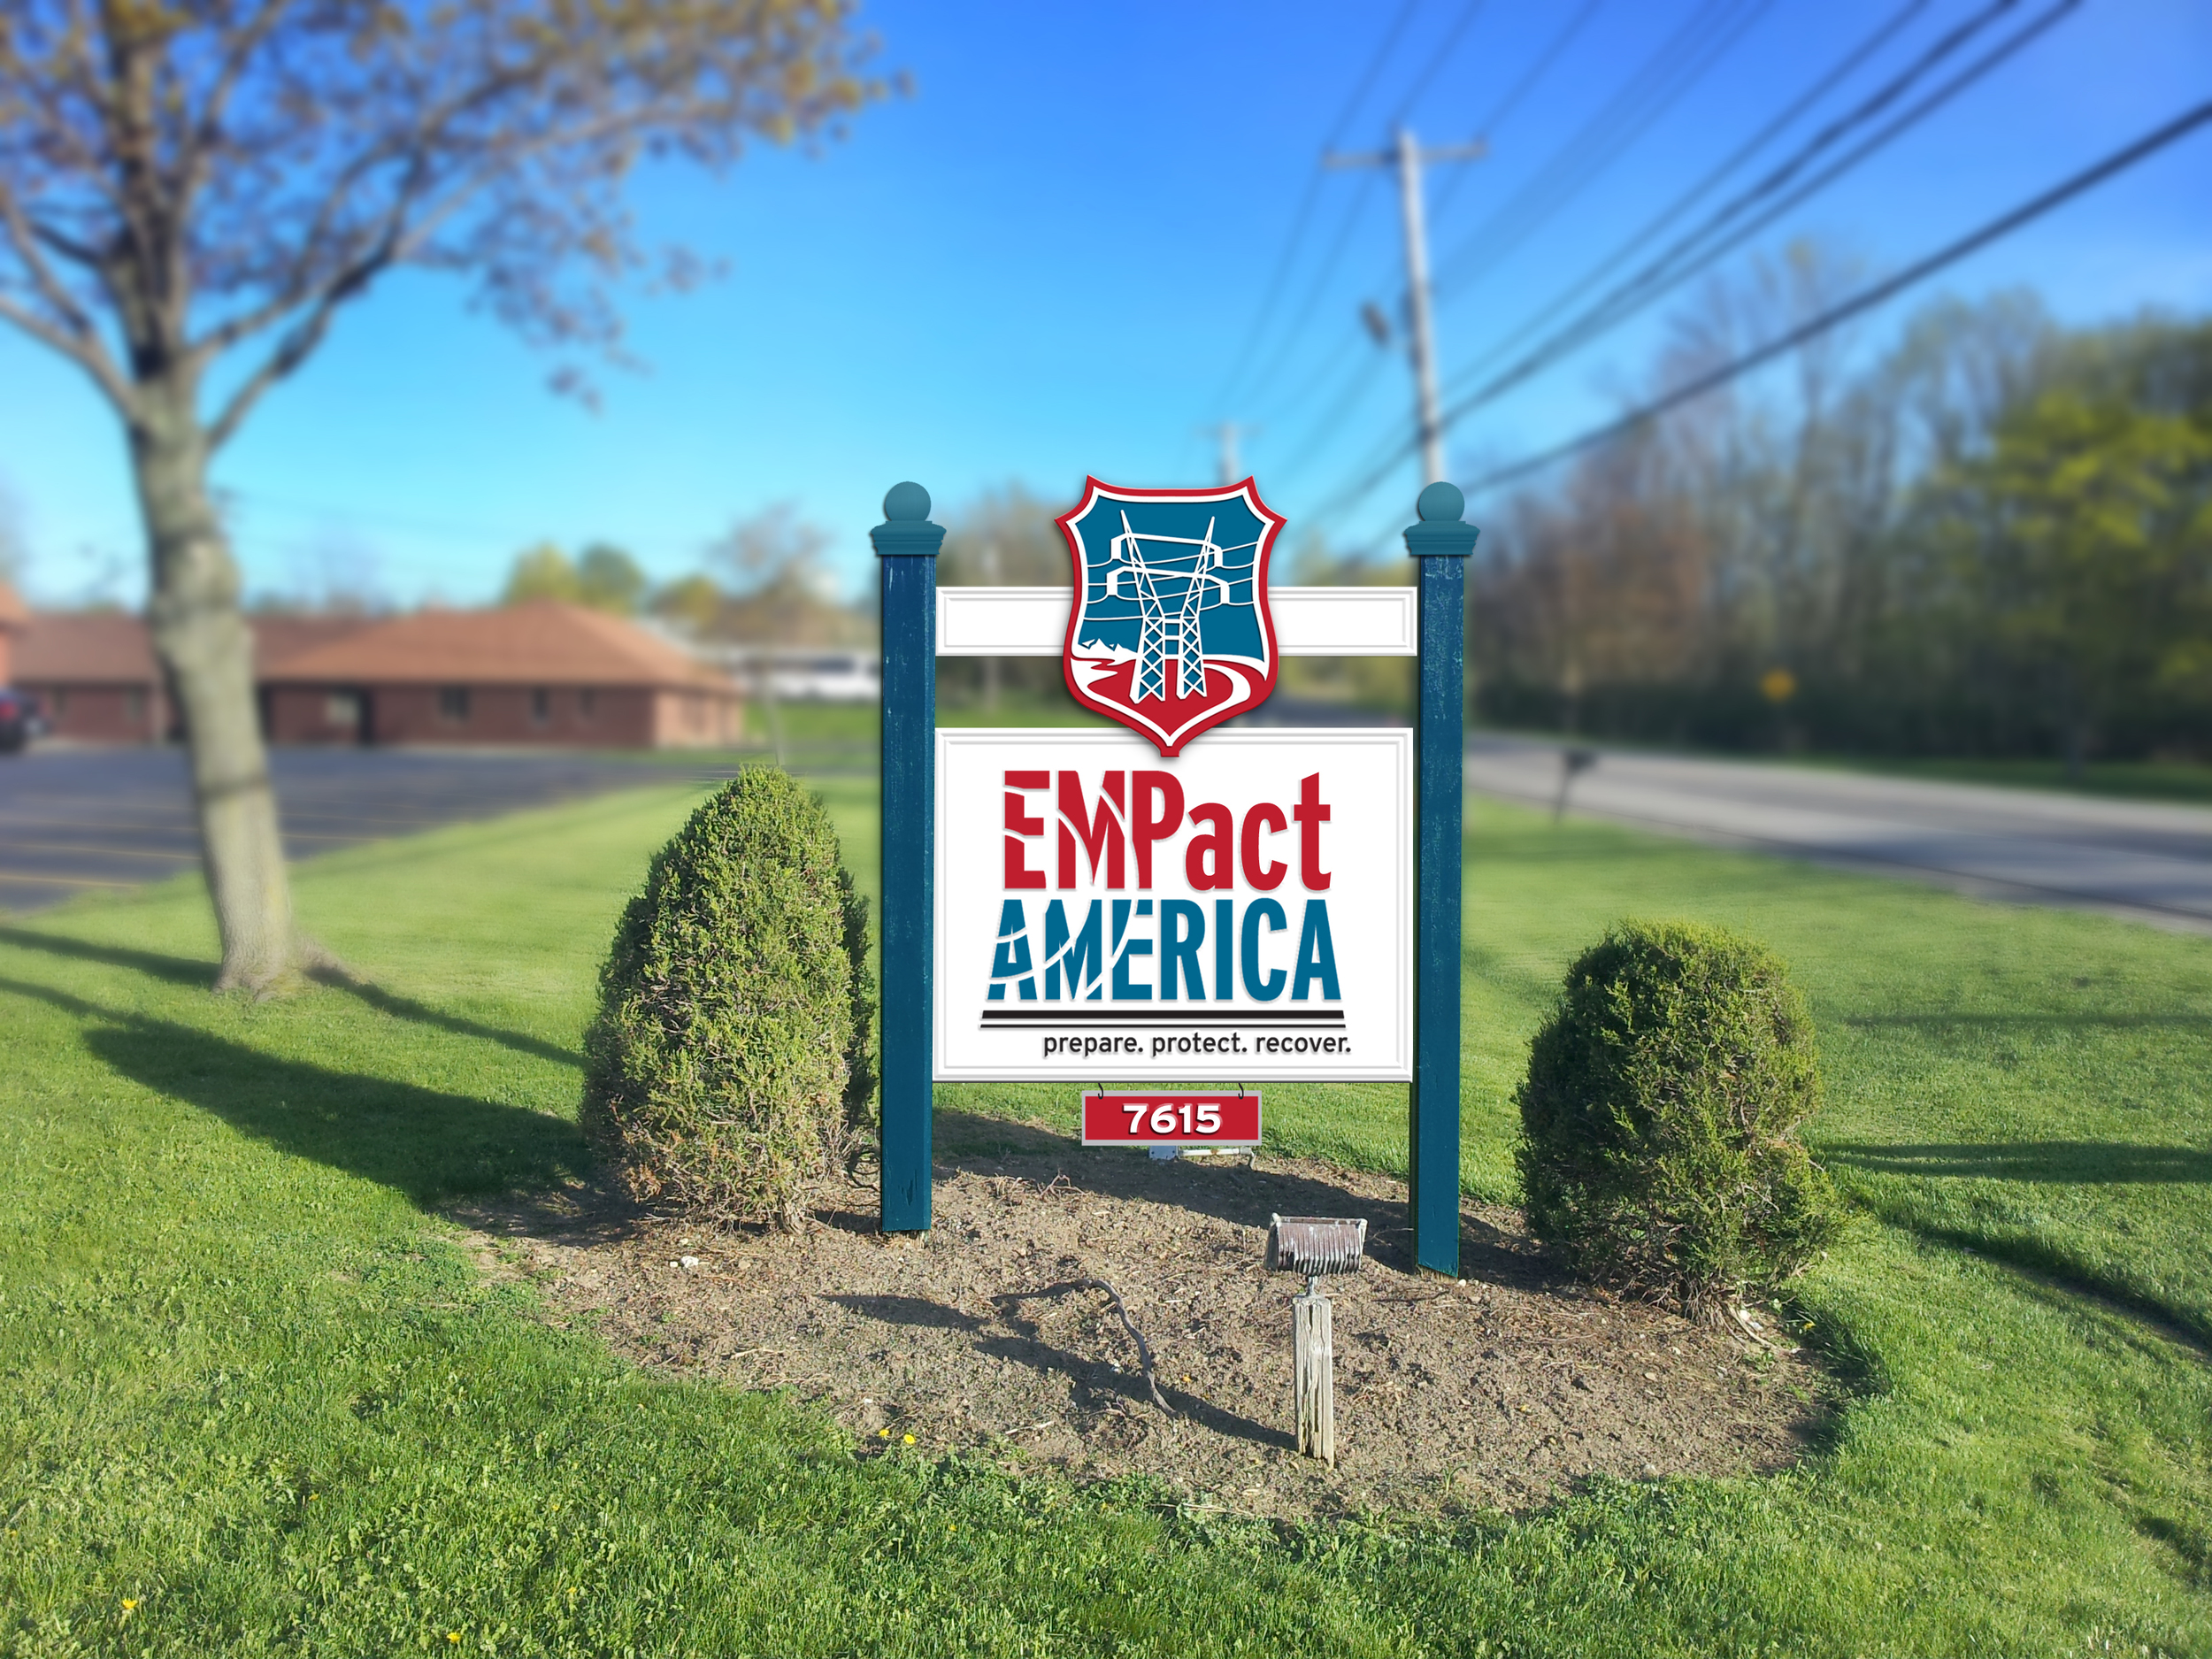 Final_EMPact_america_exterior_sign_mockup_send_REDLOGO.jpg